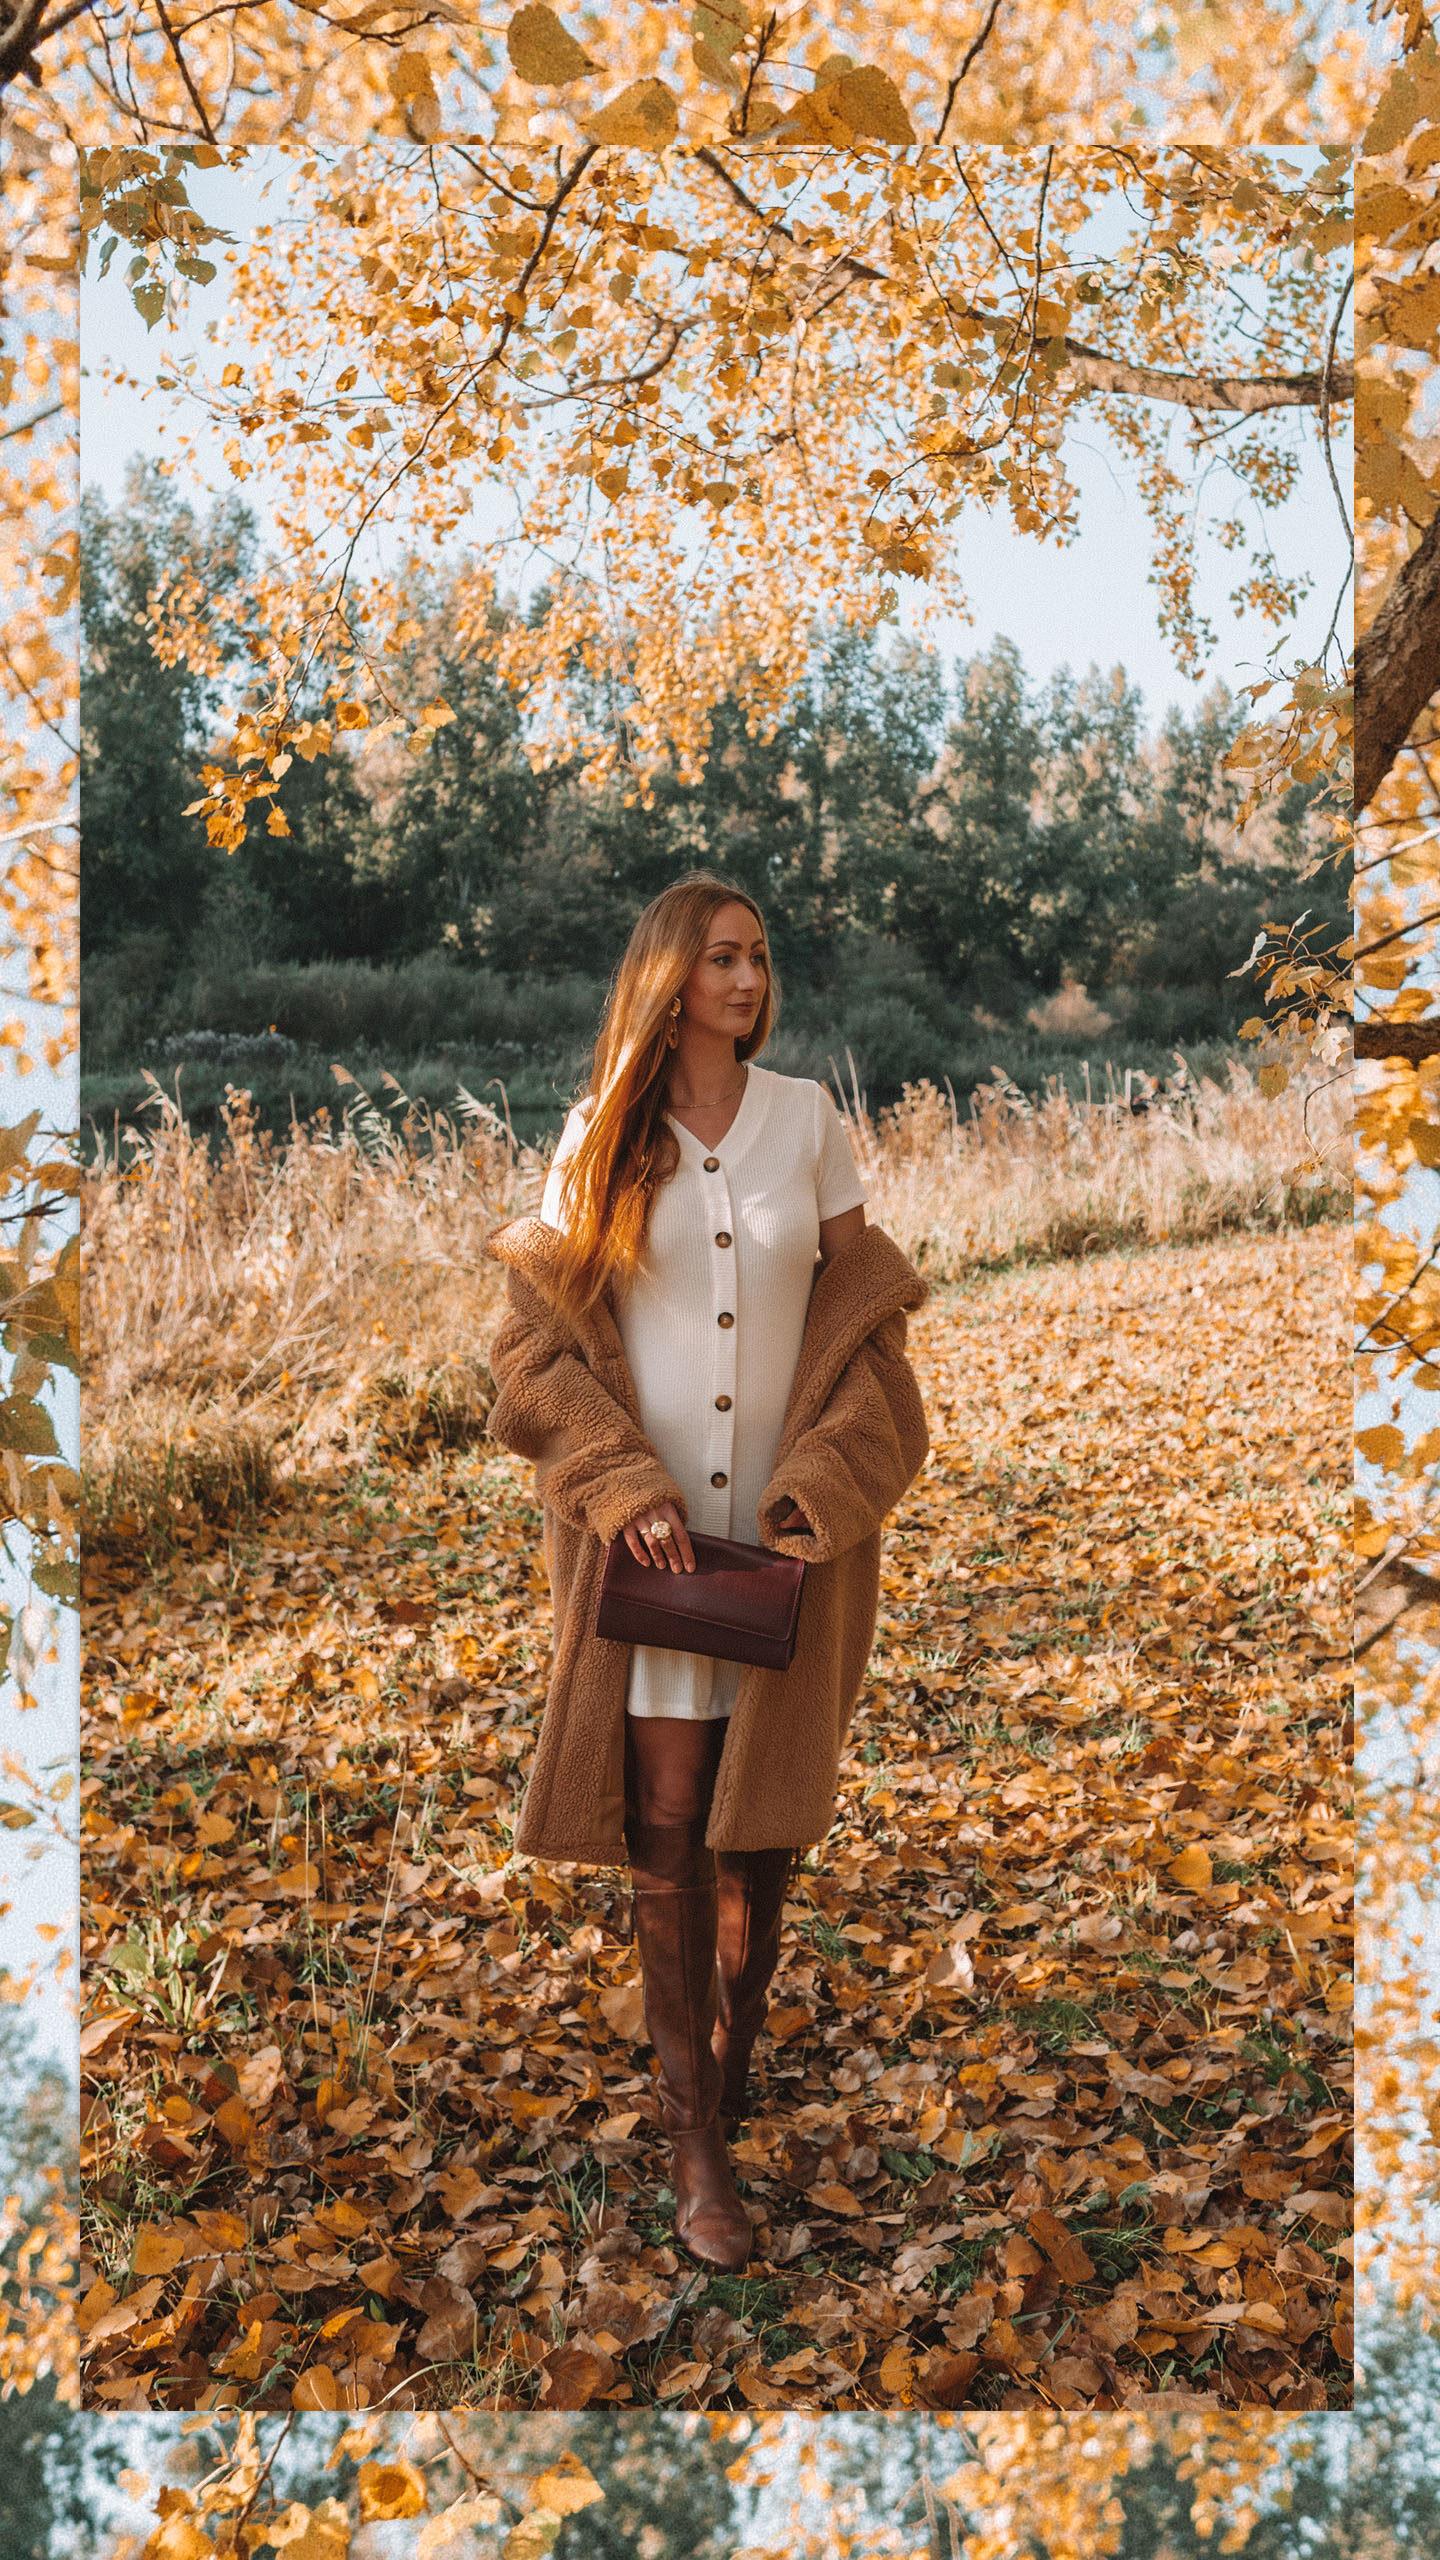 Fur-Free-Fur Linda's Wholesome Life